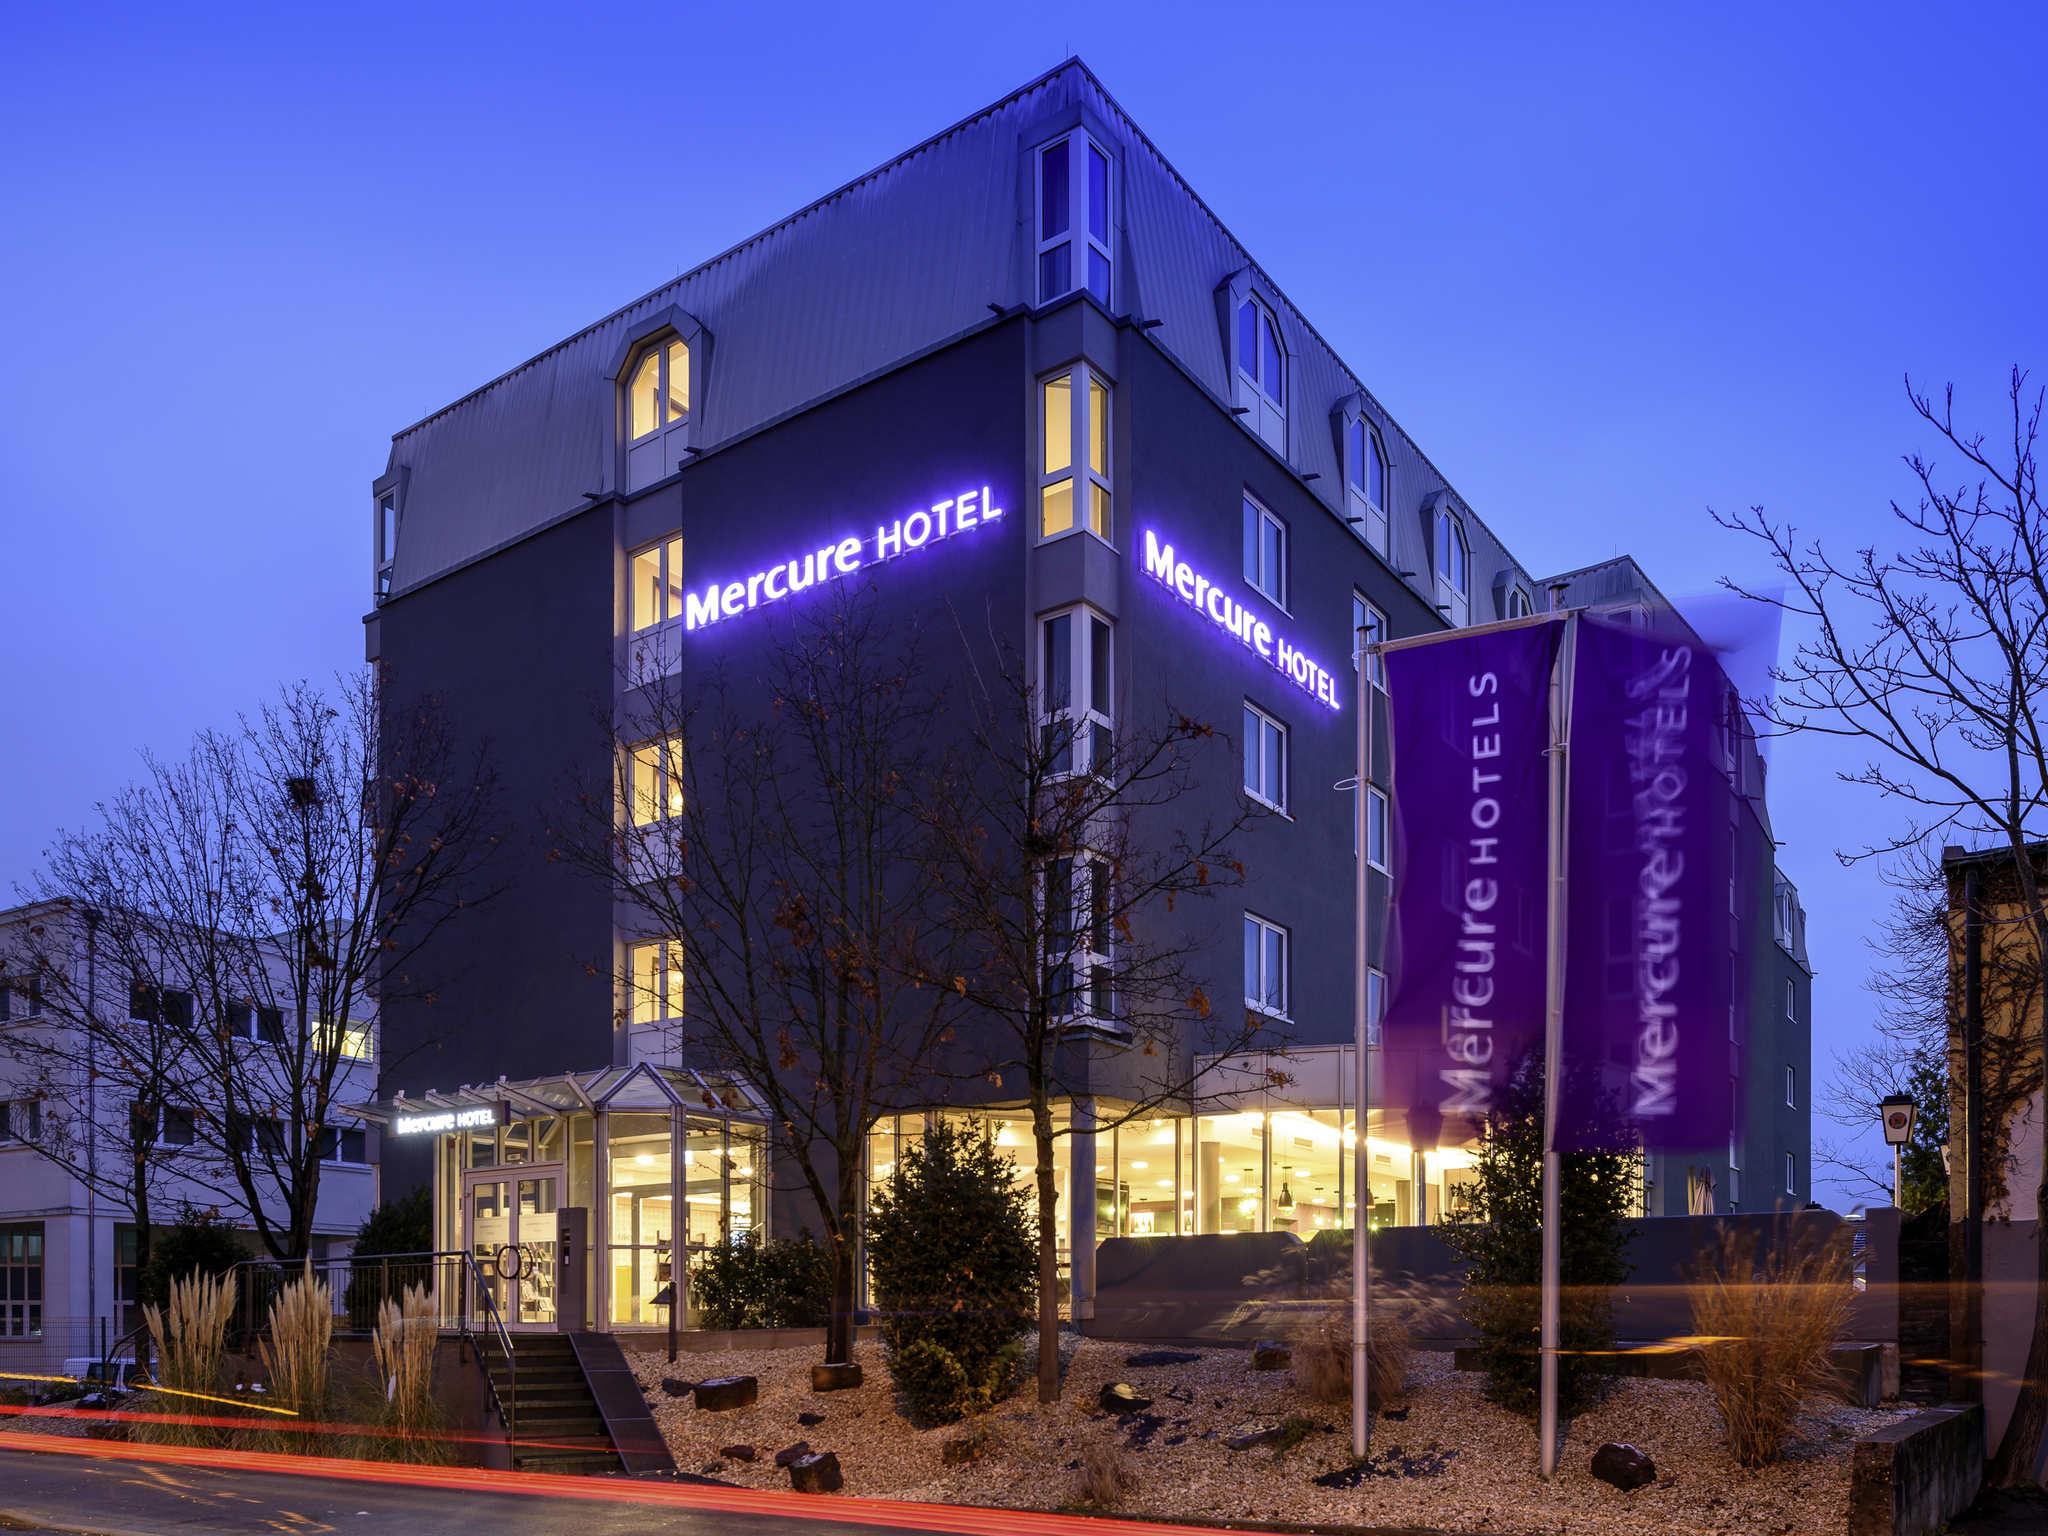 Hotel – Mercure Hotel Stuttgart Zuffenhausen (abertura em agosto 2017)